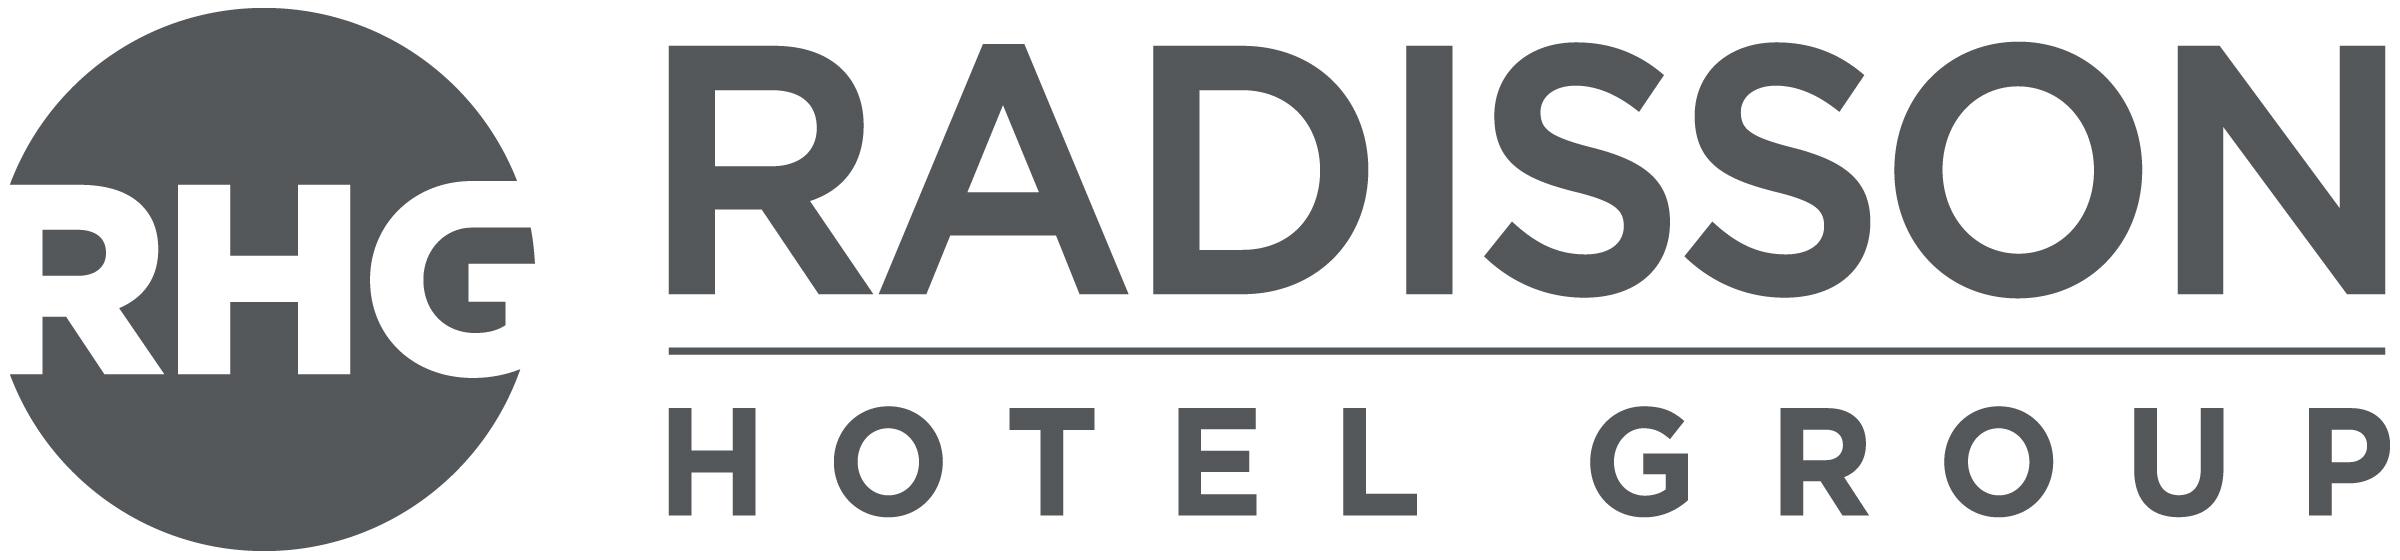 Radisson Hotel Group Logo